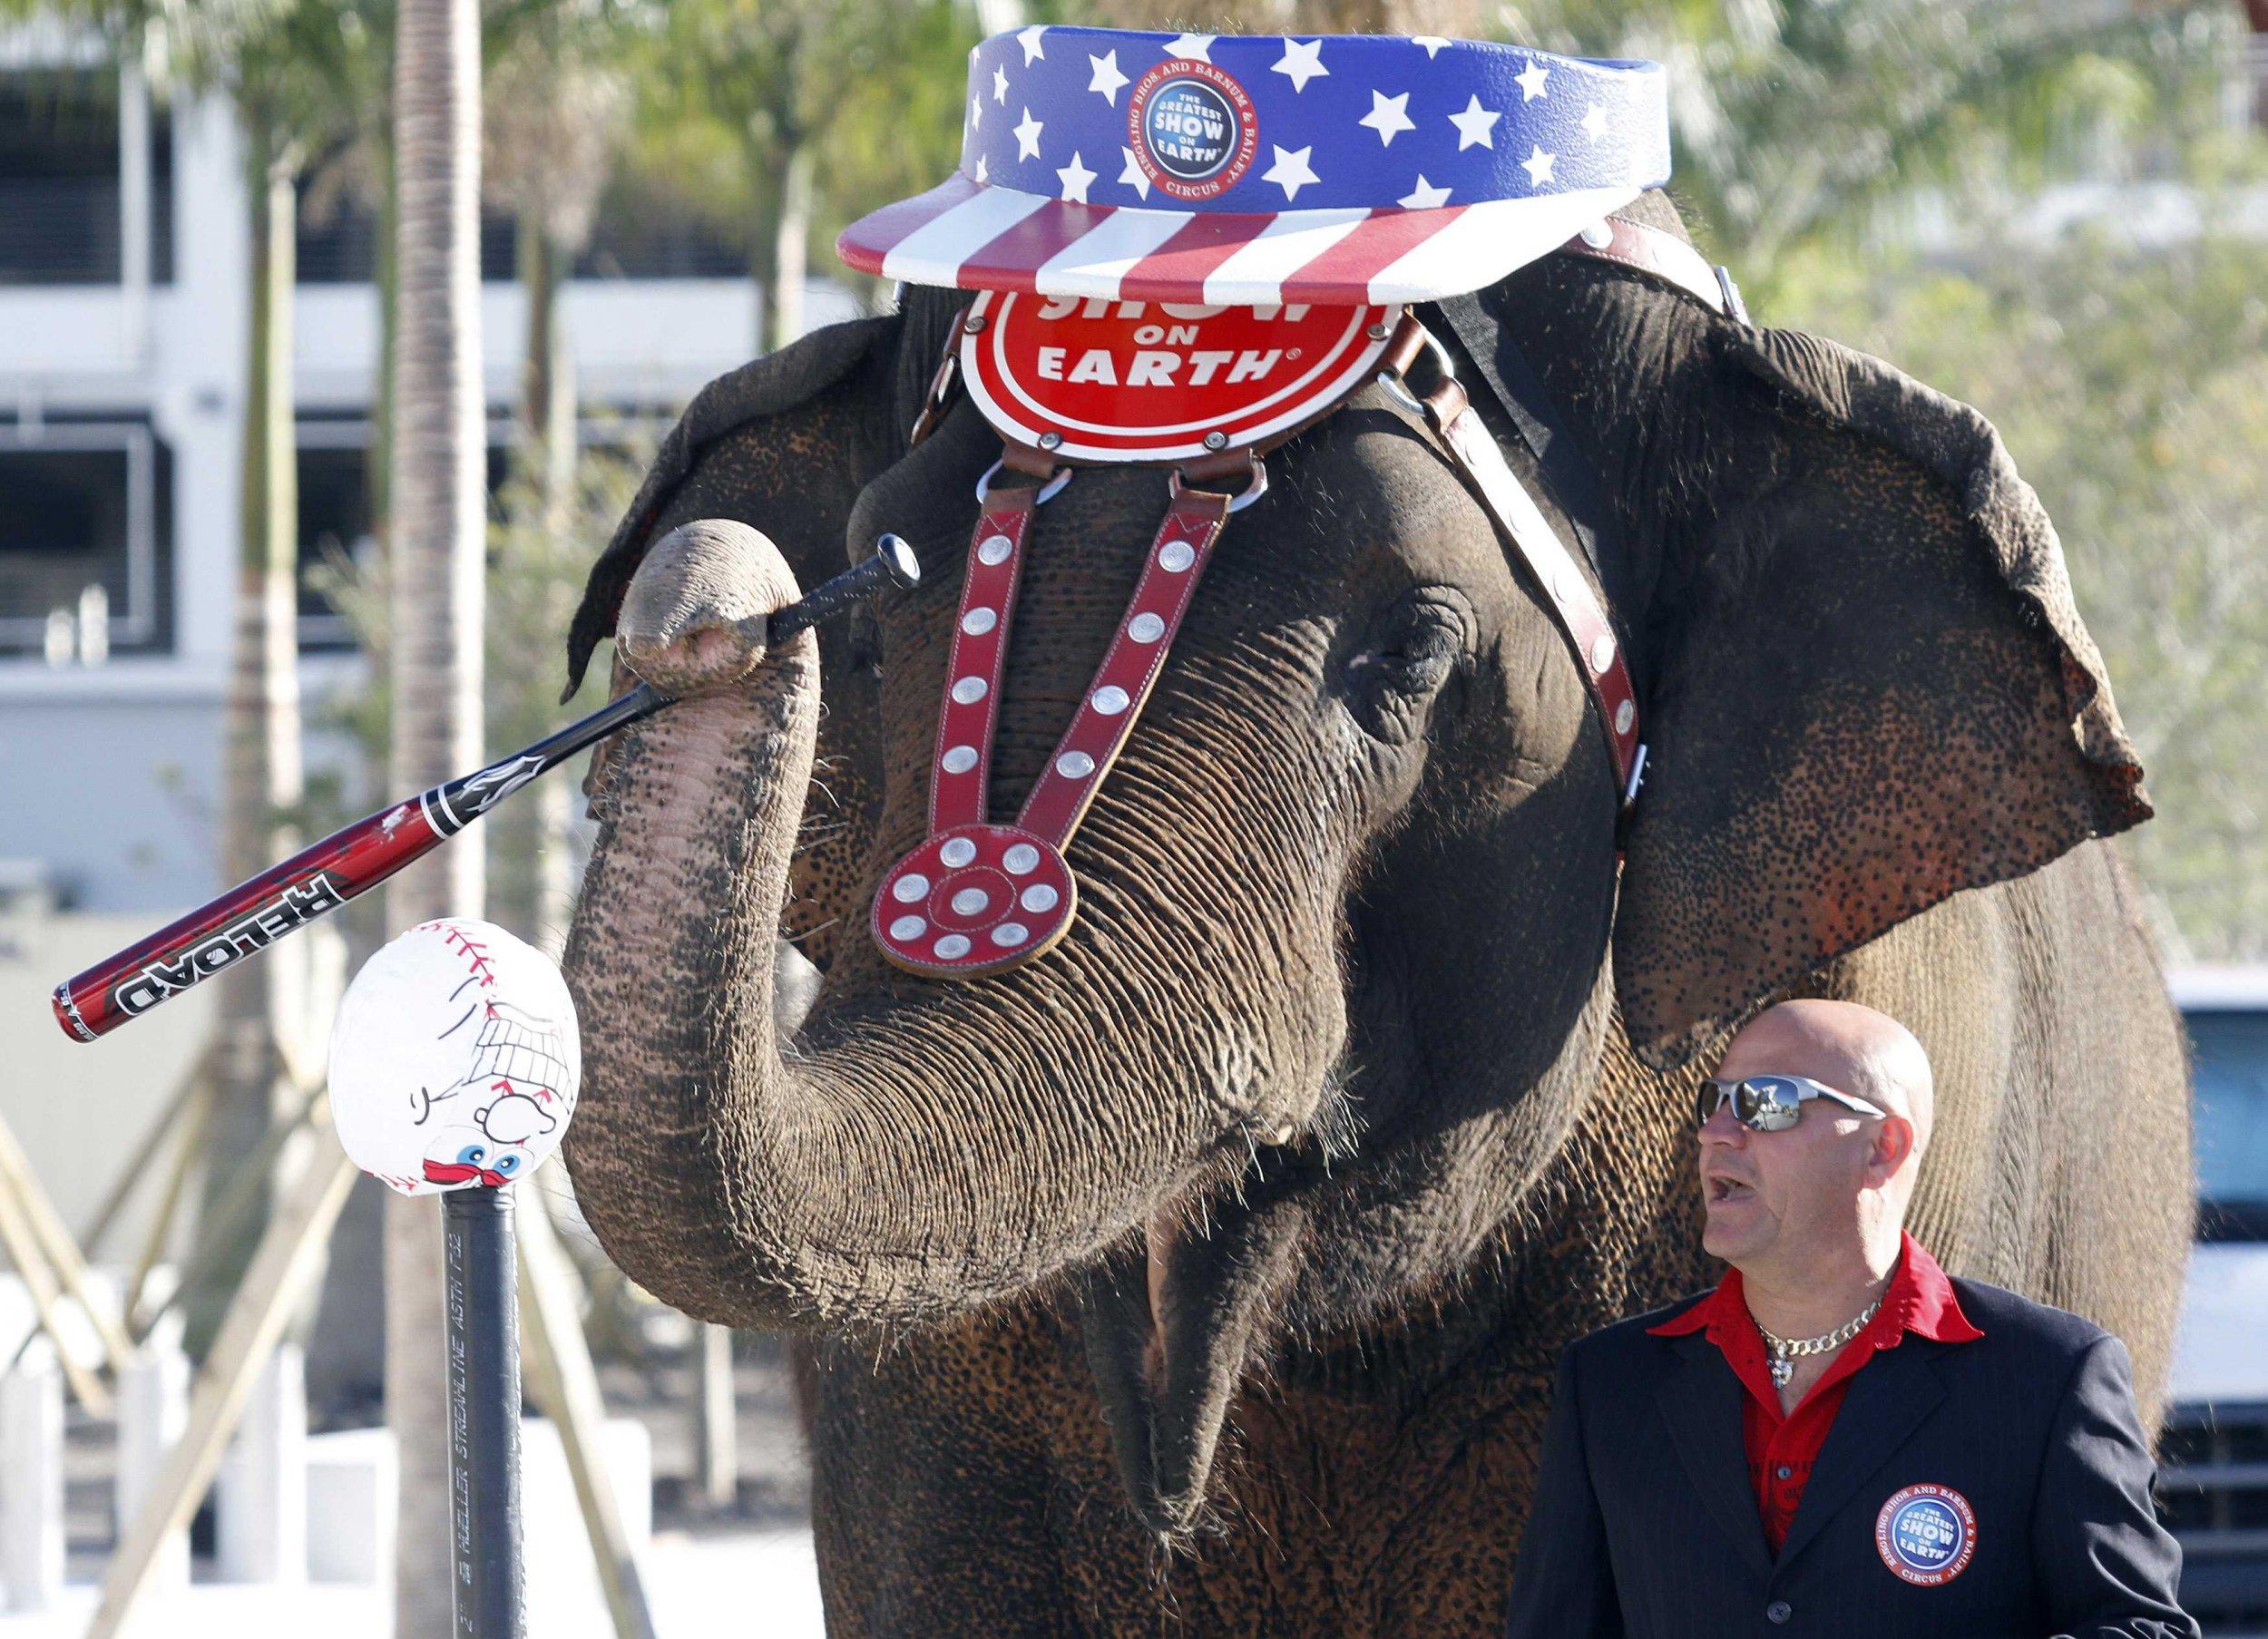 2015-03-05T145420Z_245160021_GM1E8160K8501_RTRMADP_3_USA-CIRCUS-ELEPHANTS